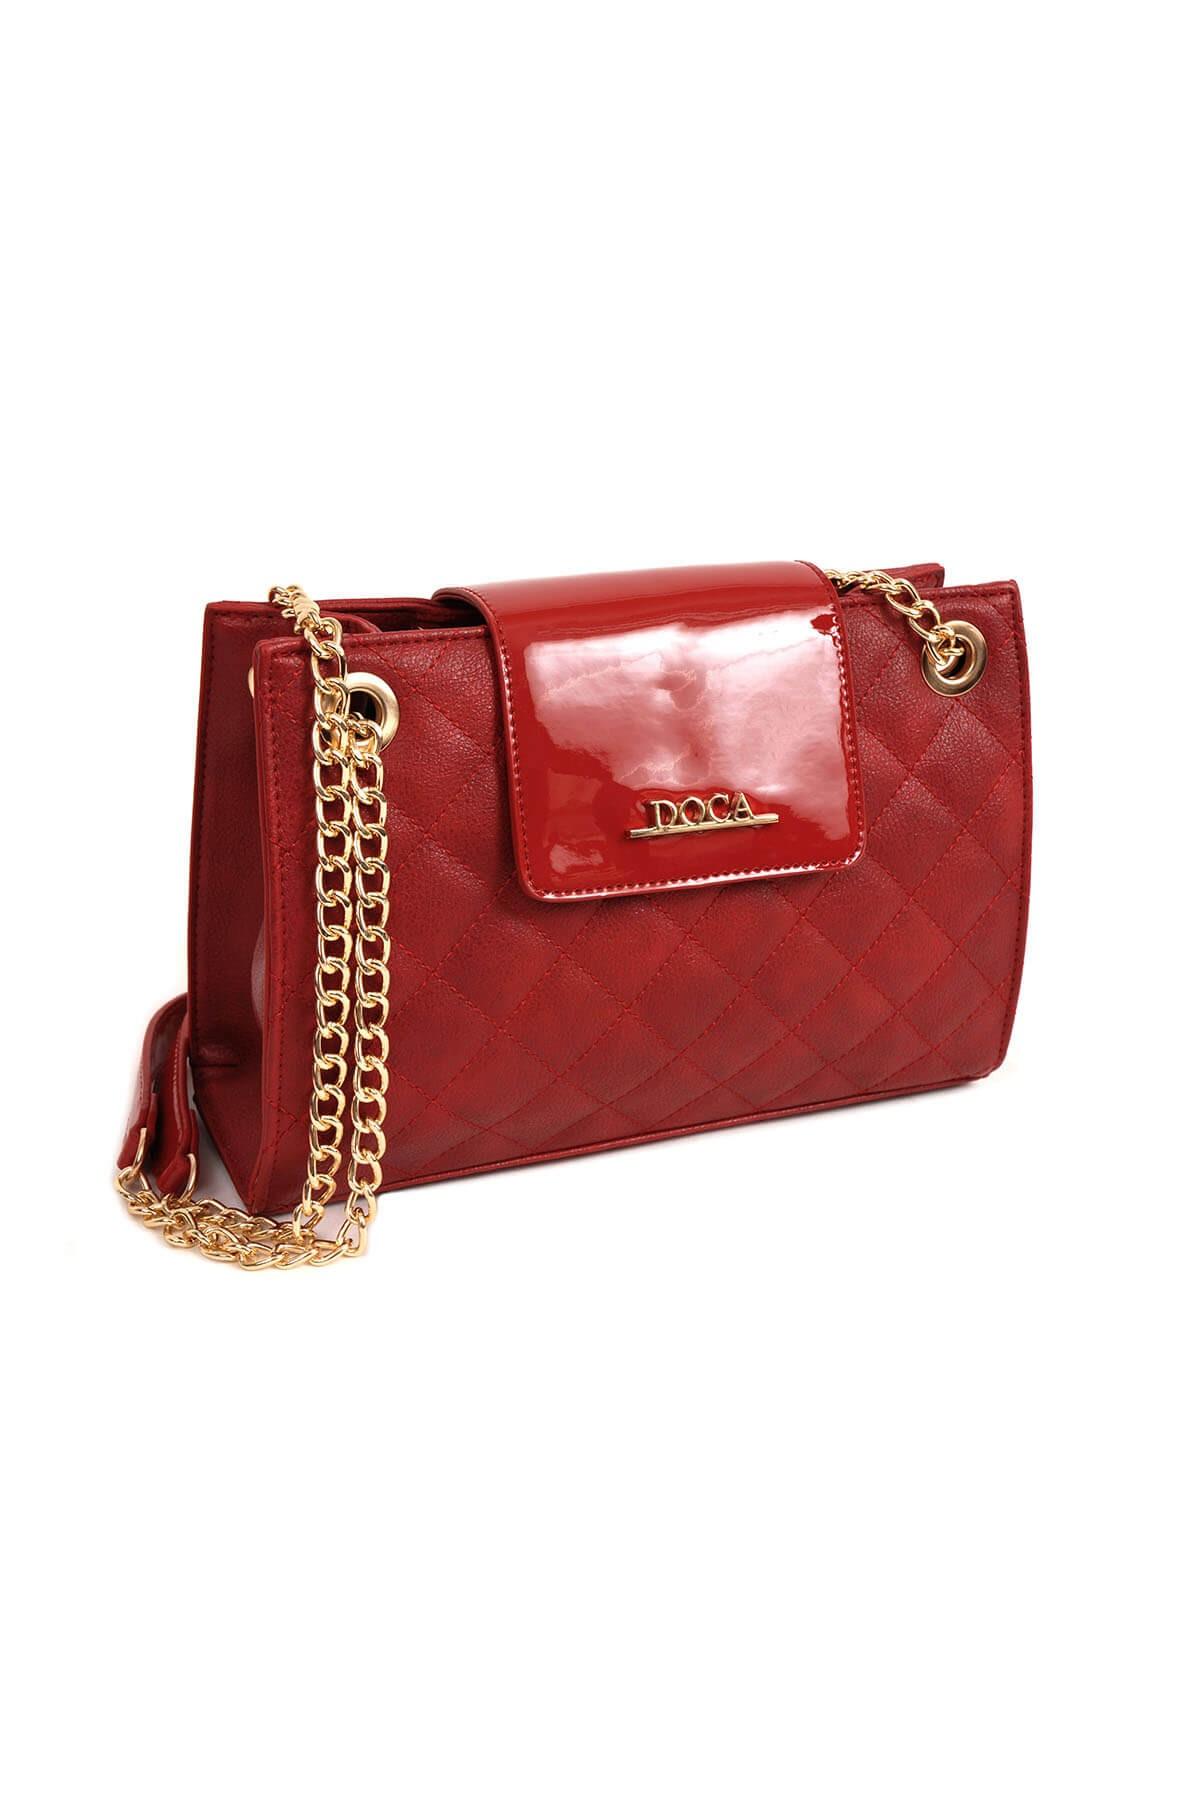 Dámská crossbody kabelka Doca 14155 - červená ab3a5e3c6a7